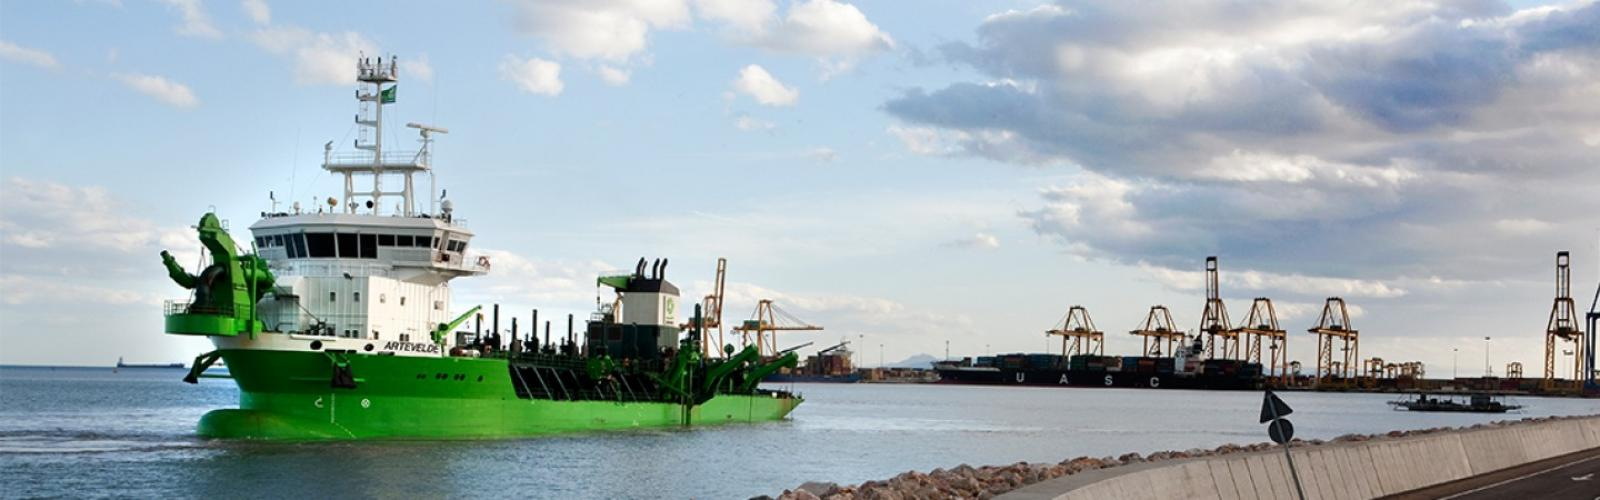 baggerboot Artevelde